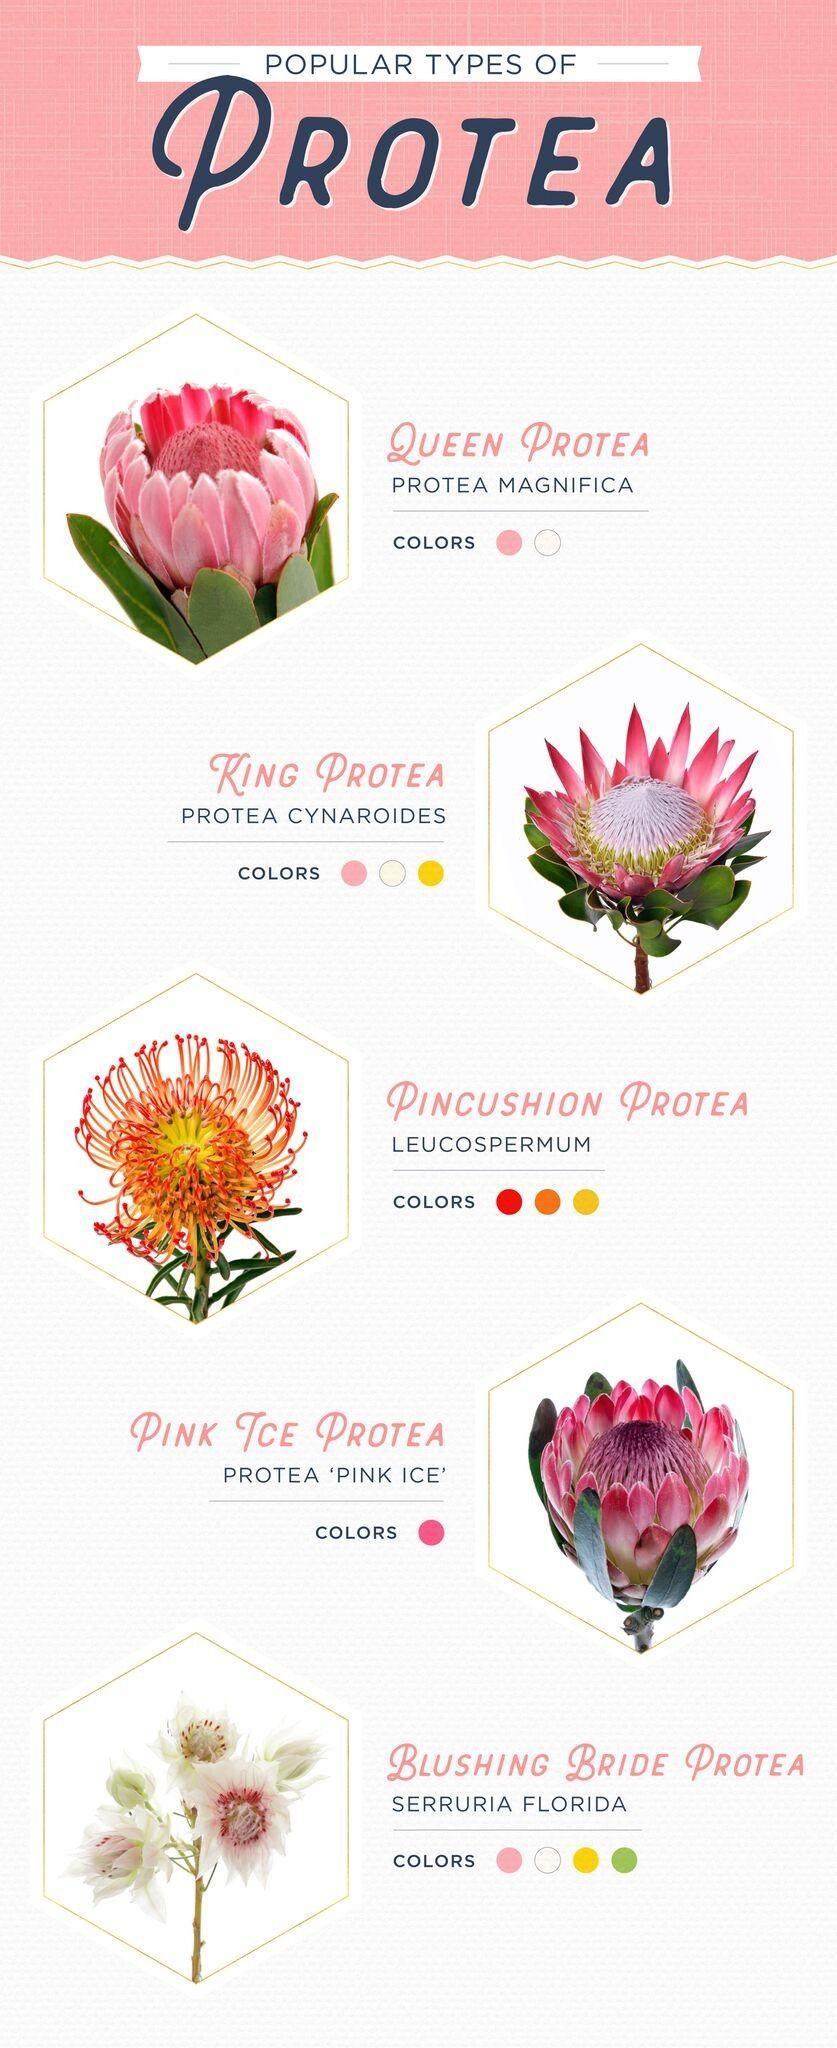 Blushing Bride Protea Daisy Wedding Flowers Peony Bouquet Wedding Protea Flower